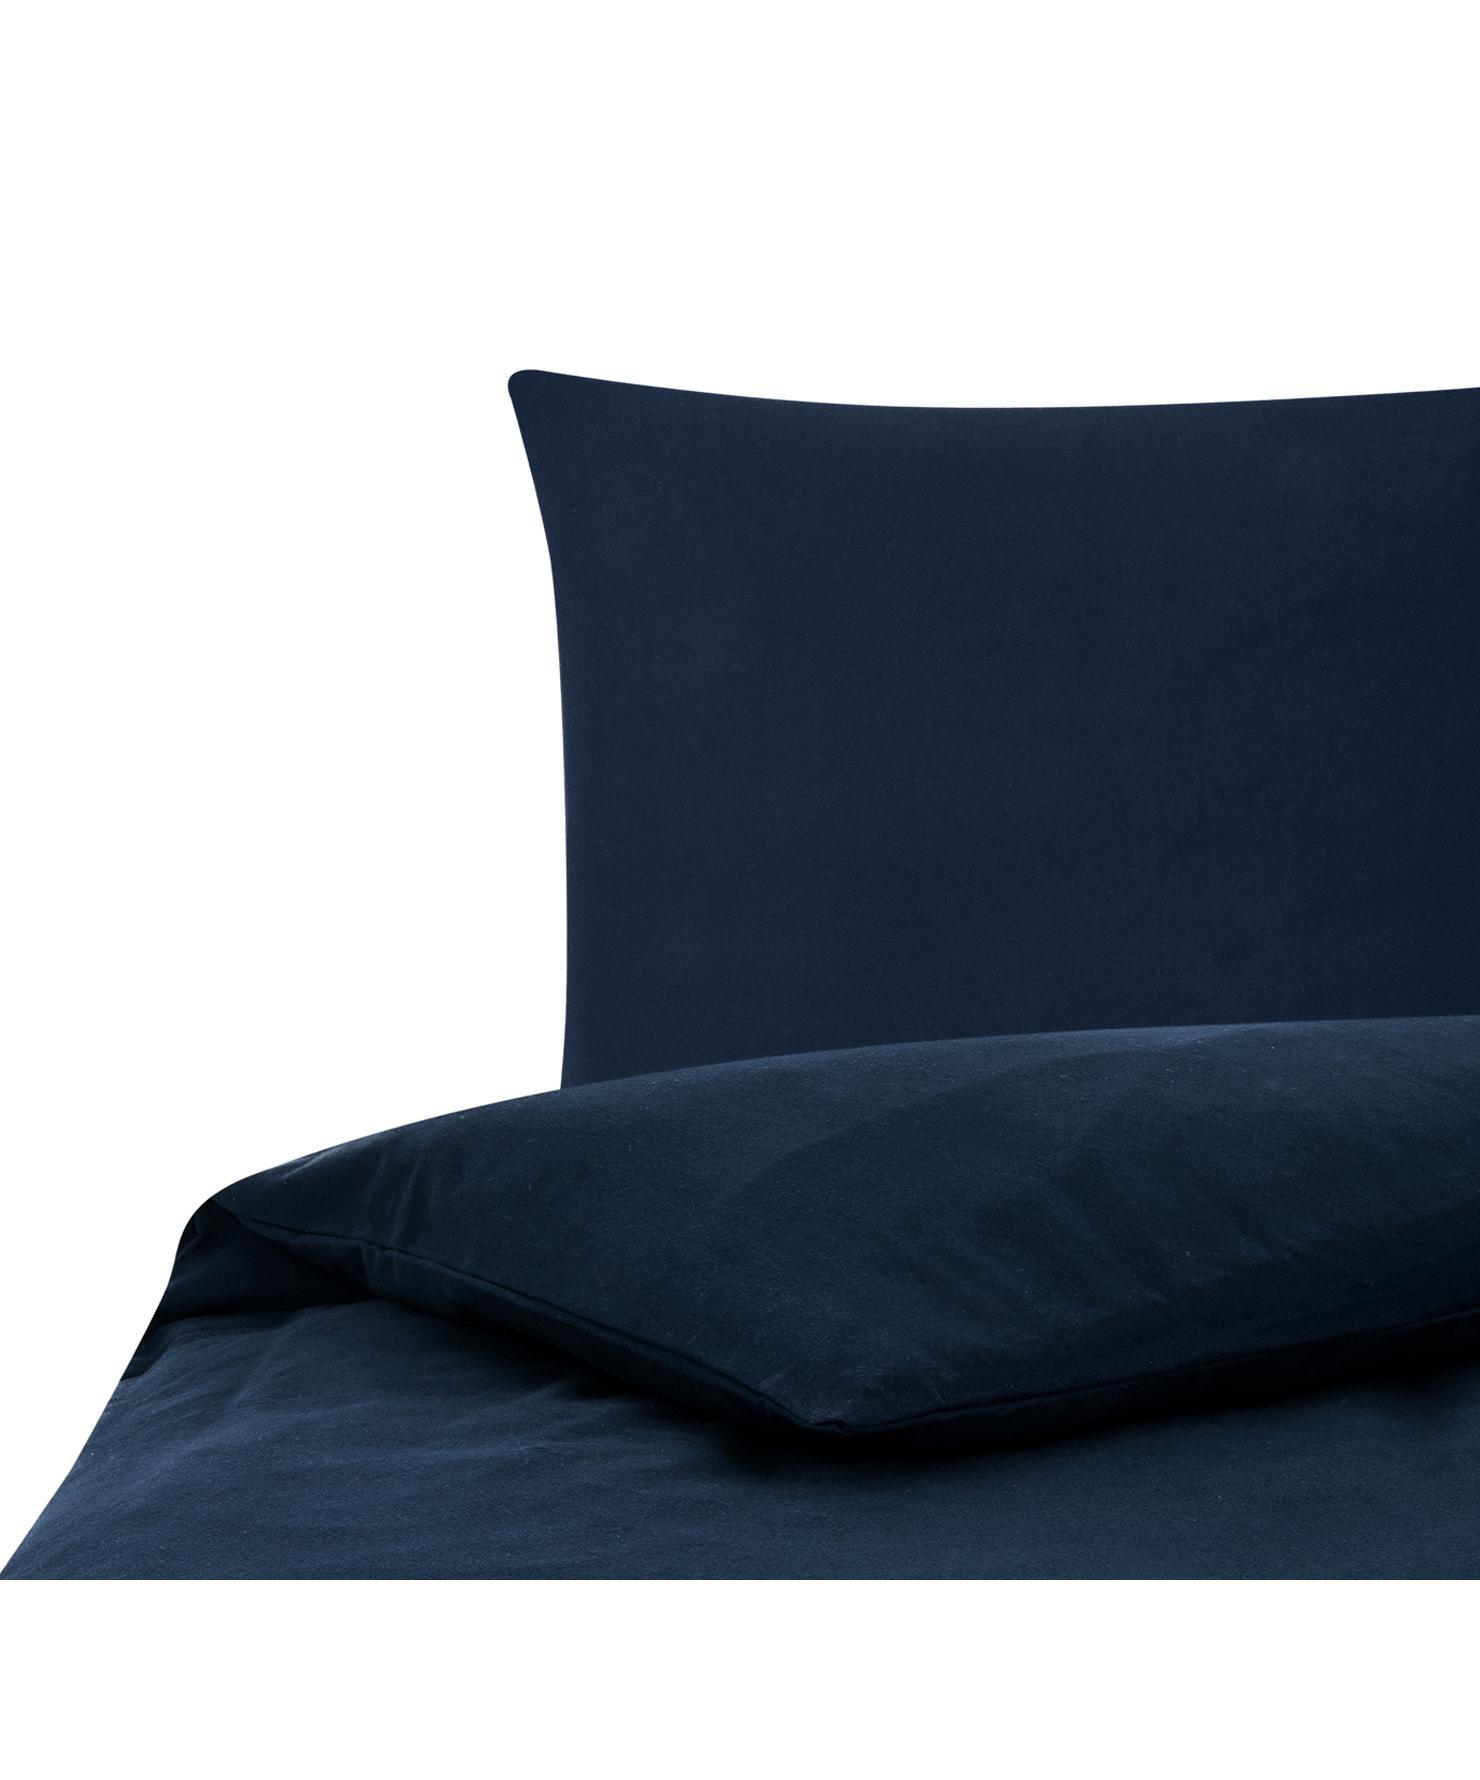 Flanell-Bettwäsche Biba in Navyblau, Webart: Flanell Flanell ist ein s, Navyblau, 135 x 200 cm + 1 Kissen 80 x 80 cm